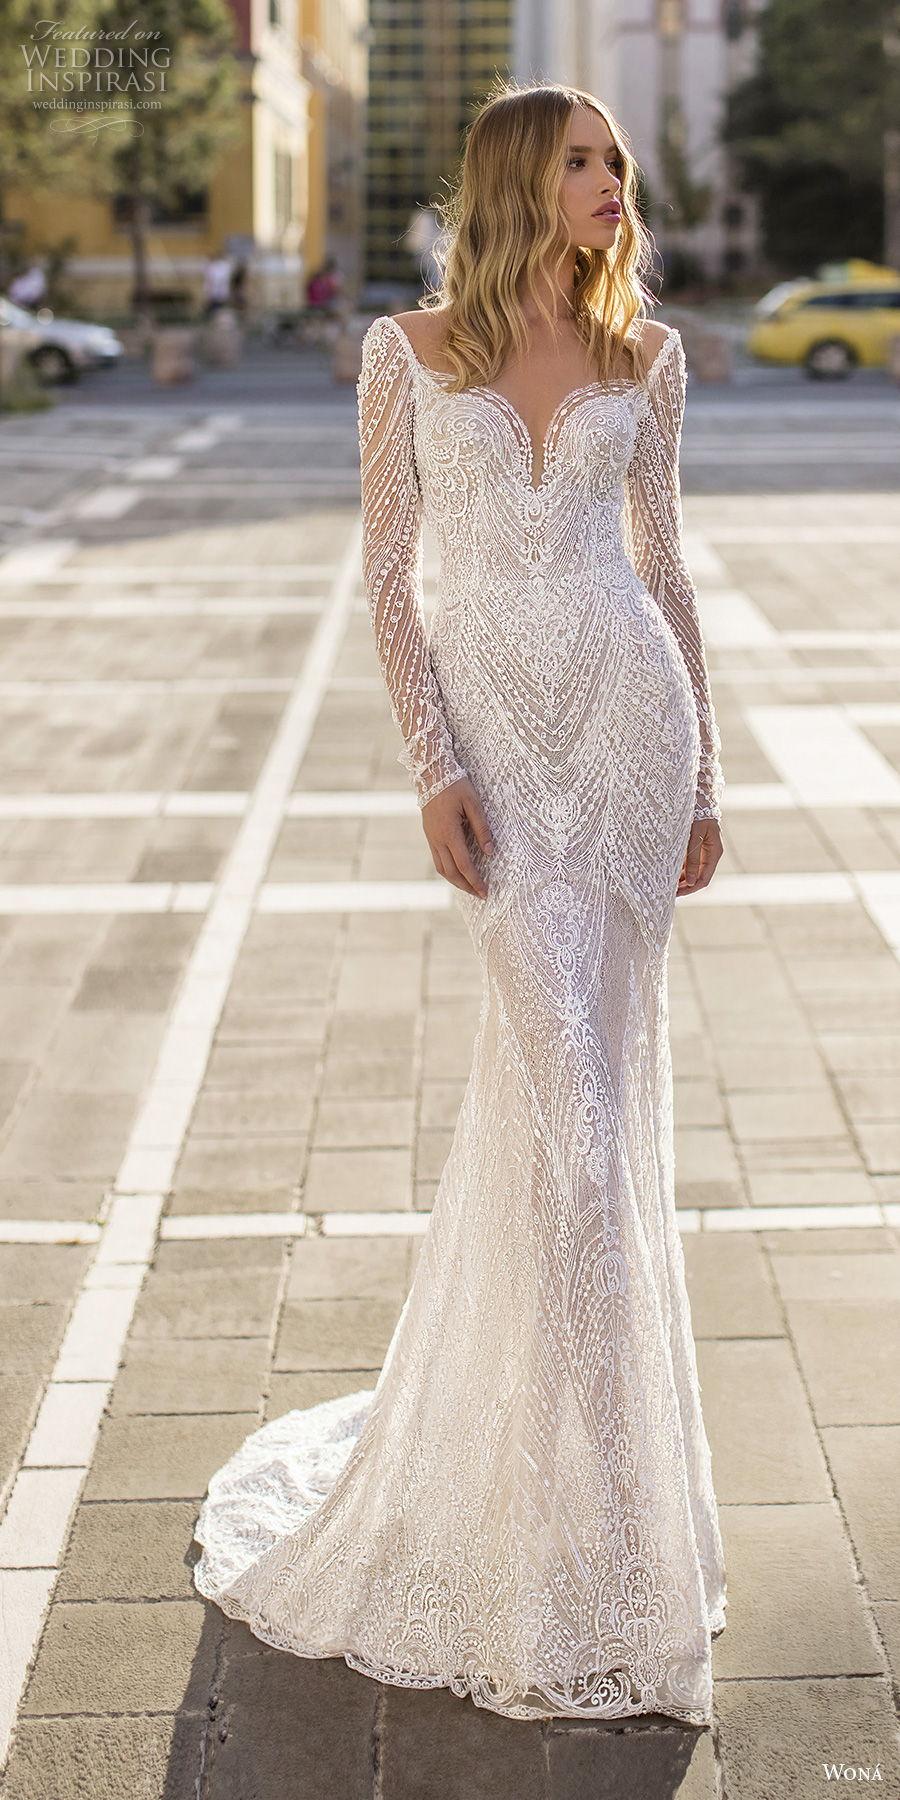 wona 2020 couture bridal long sleeves deep sweetheart neckline full embellishment elegant fit and flare sheath wedding dress backless scoop back chapel train (12) mv